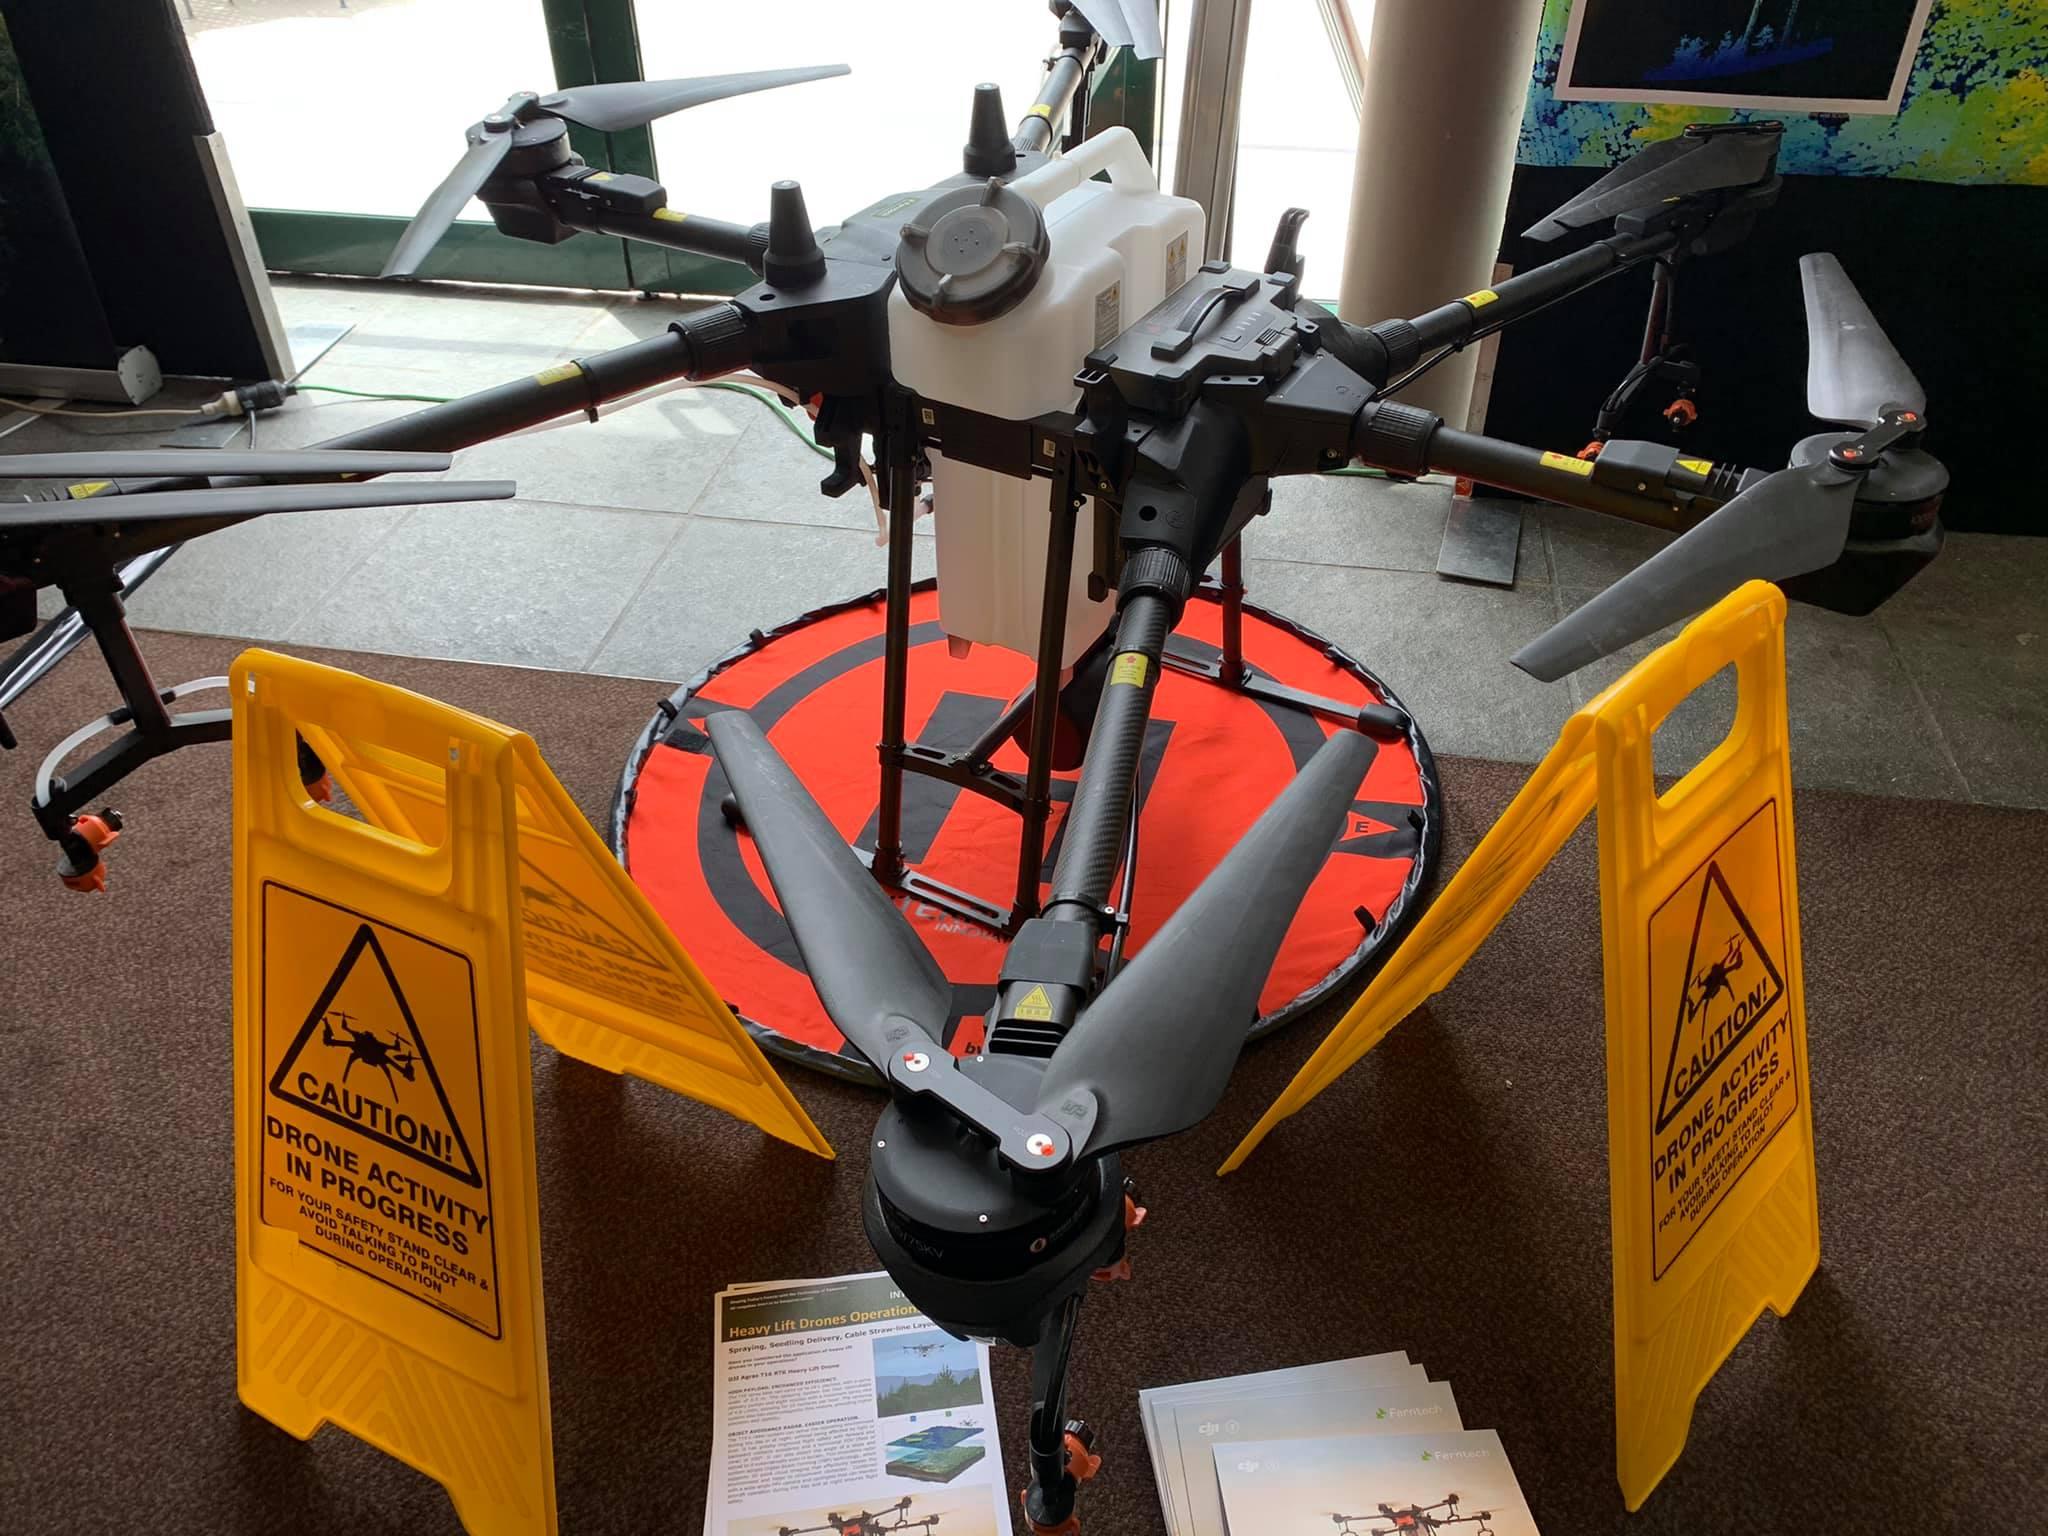 ForestTECH 2020 Conference Rotorua - DJI T16 Spray Drone